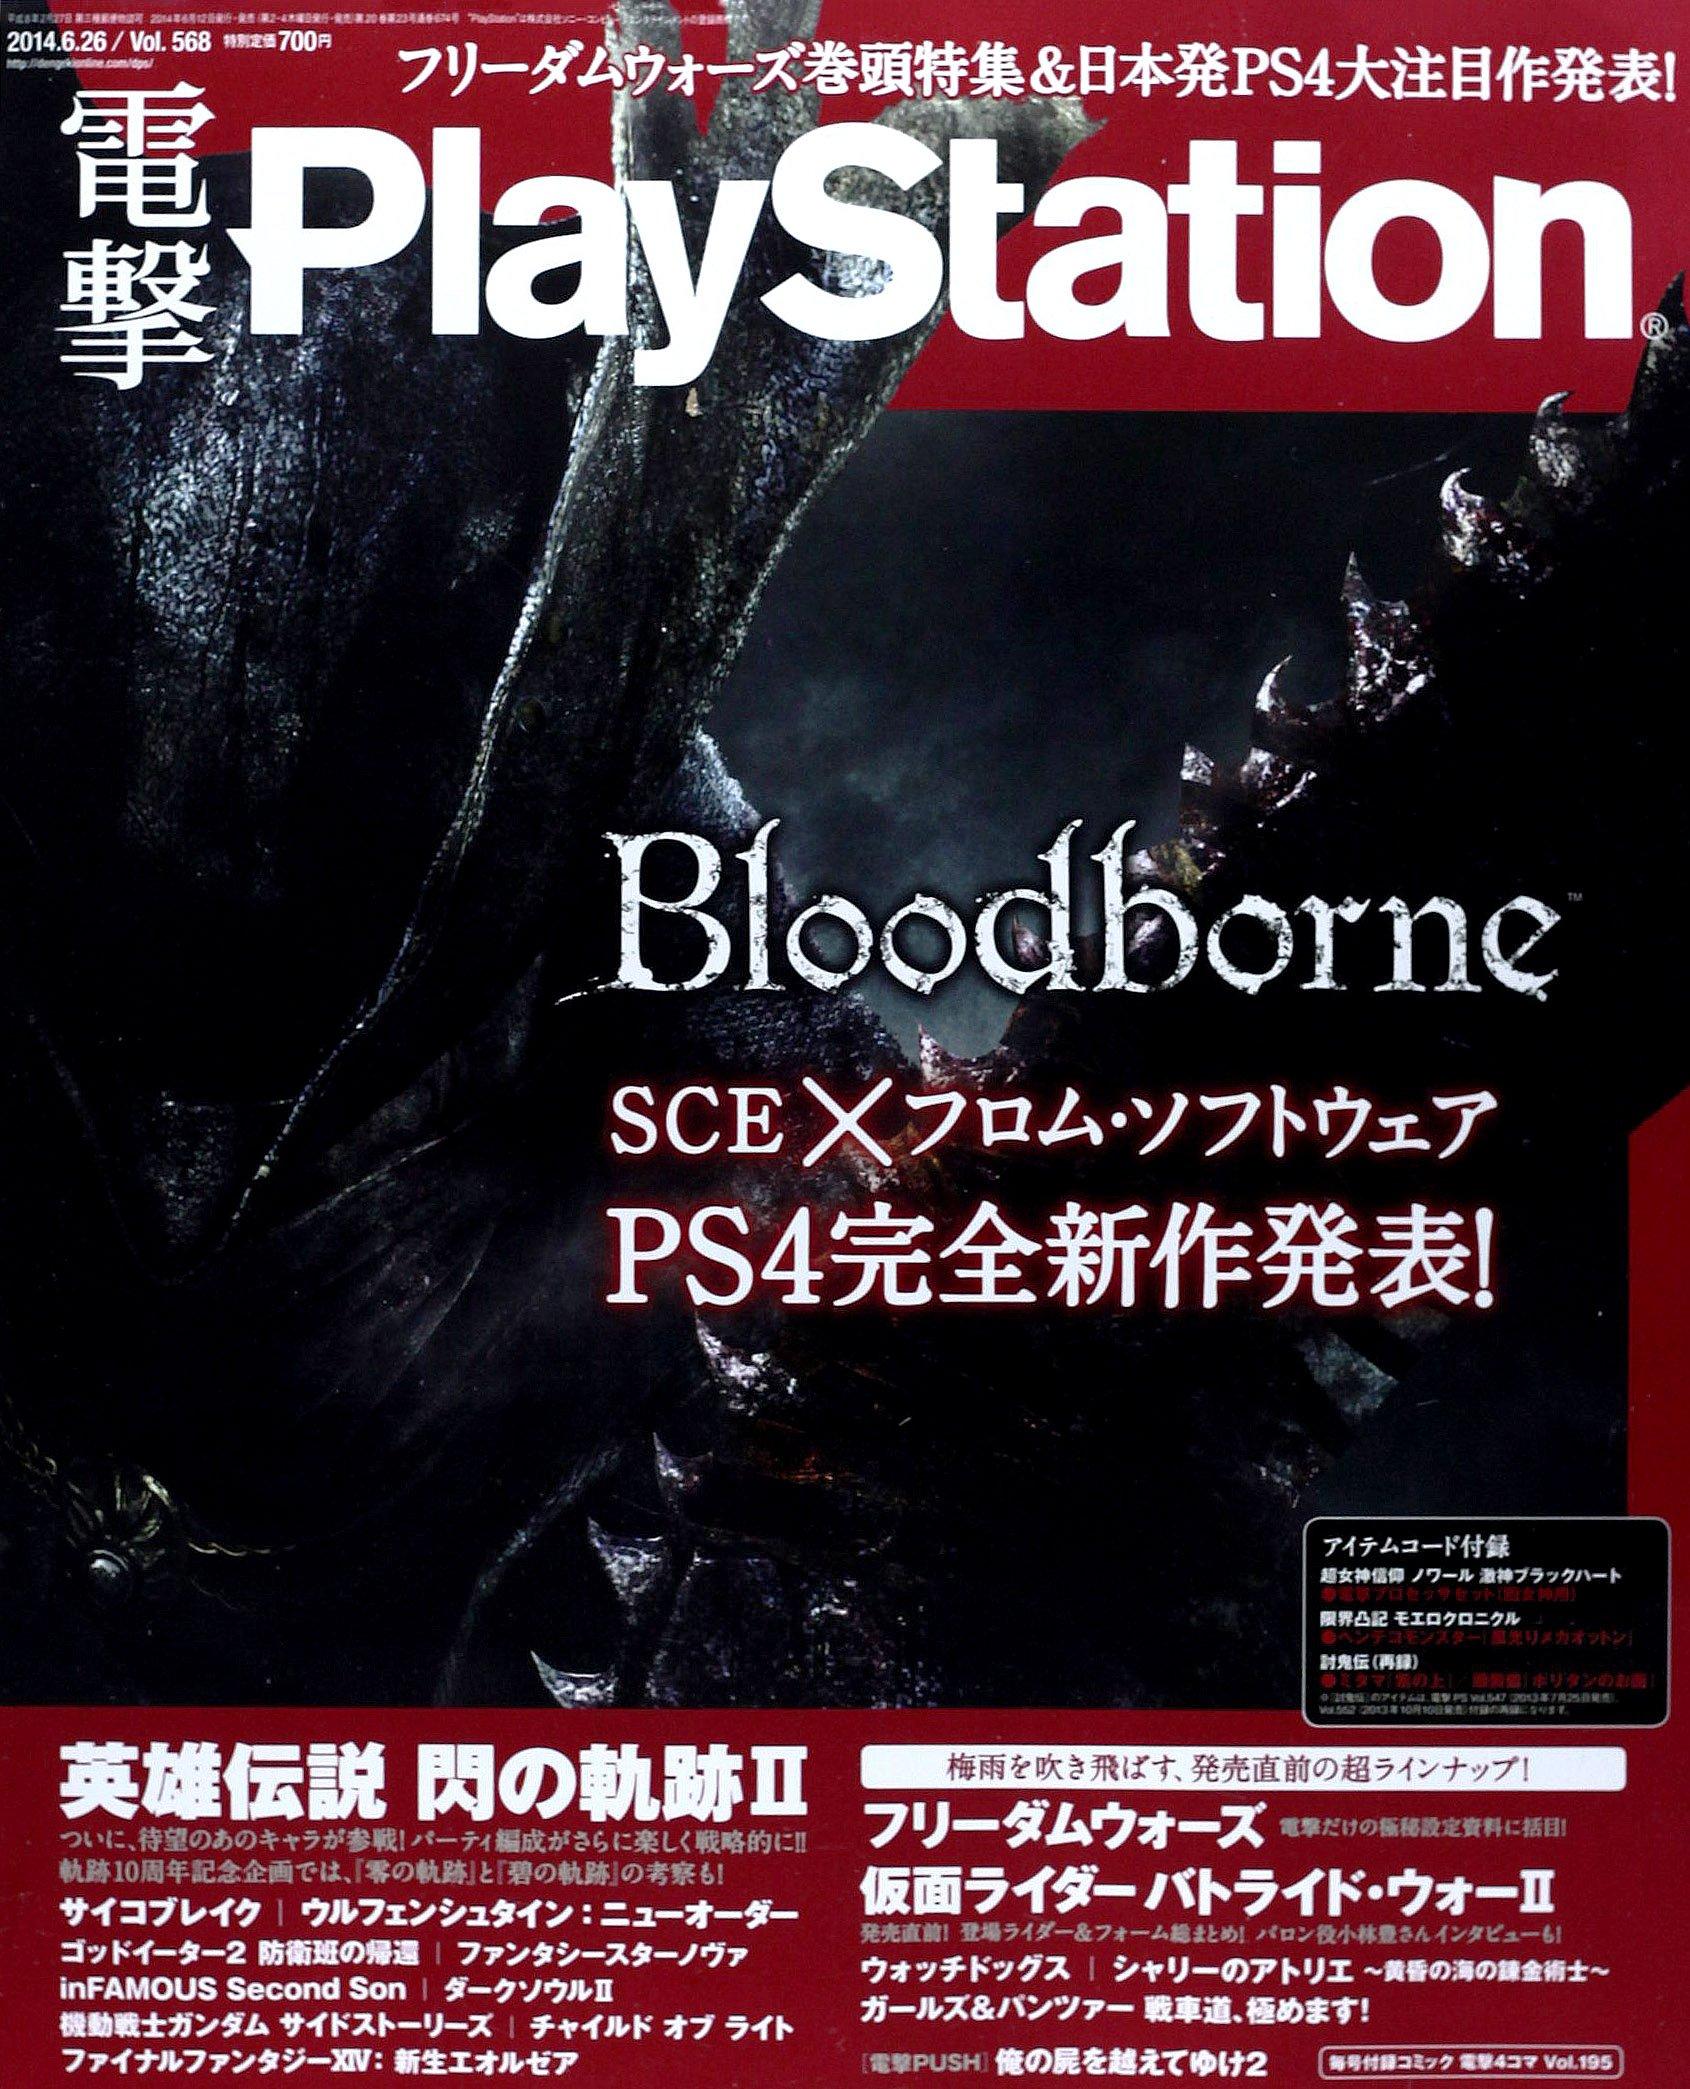 Dengeki PlayStation 568 (June 26, 2014)